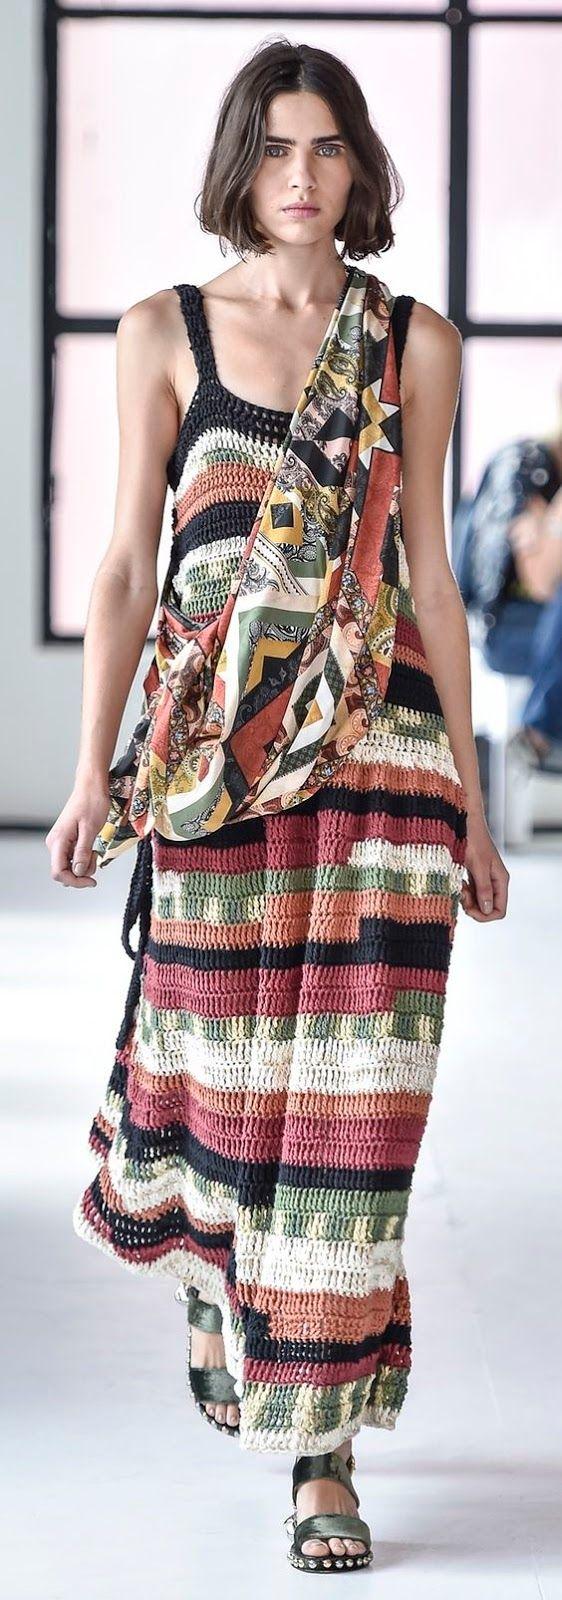 Crochetemoda Blog: Vestido de Crochet